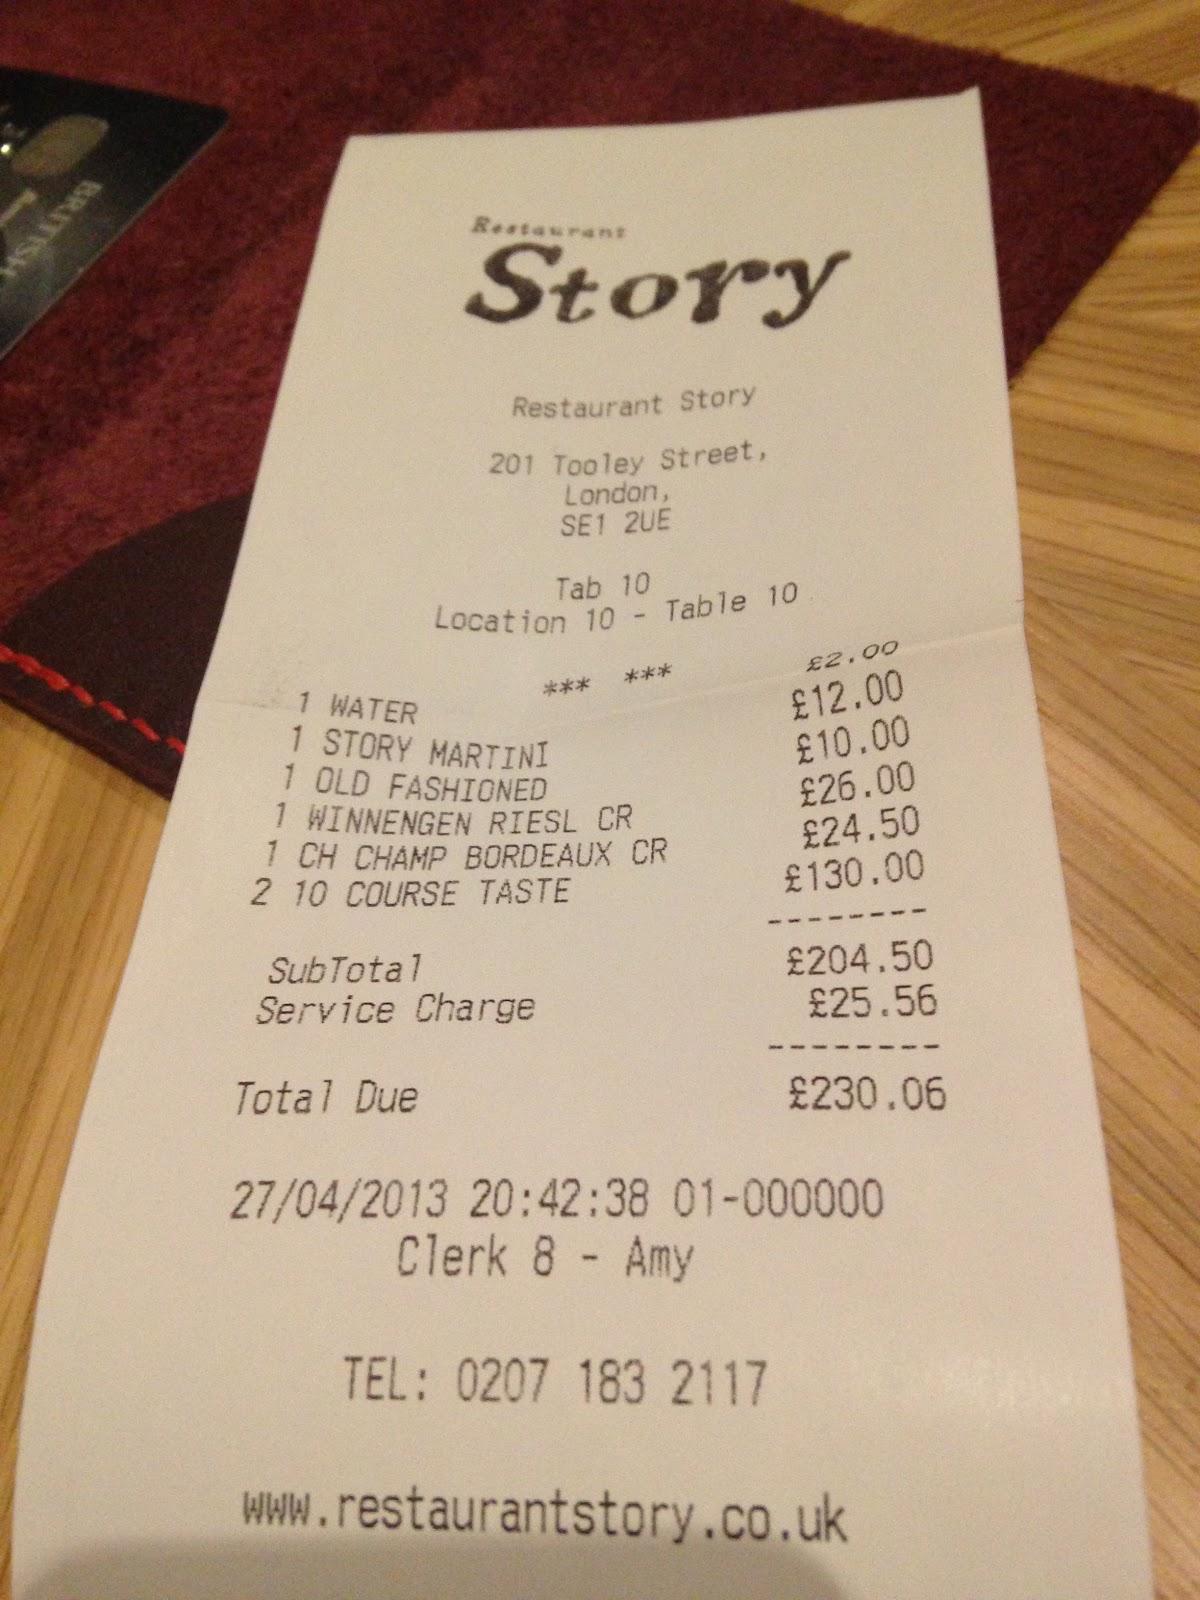 Restaurant Story Tooley Street